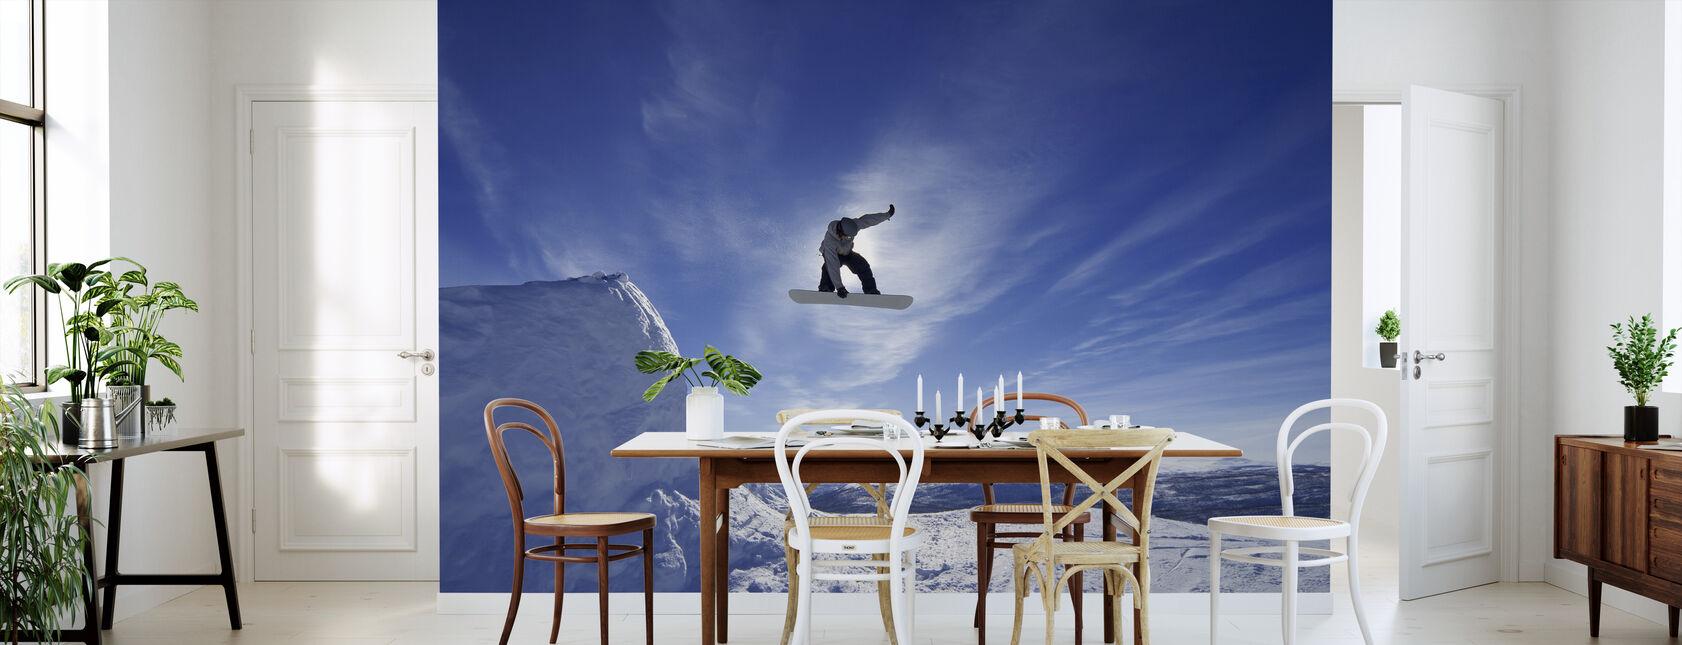 Snowboard Big Air Jump - Wallpaper - Kitchen